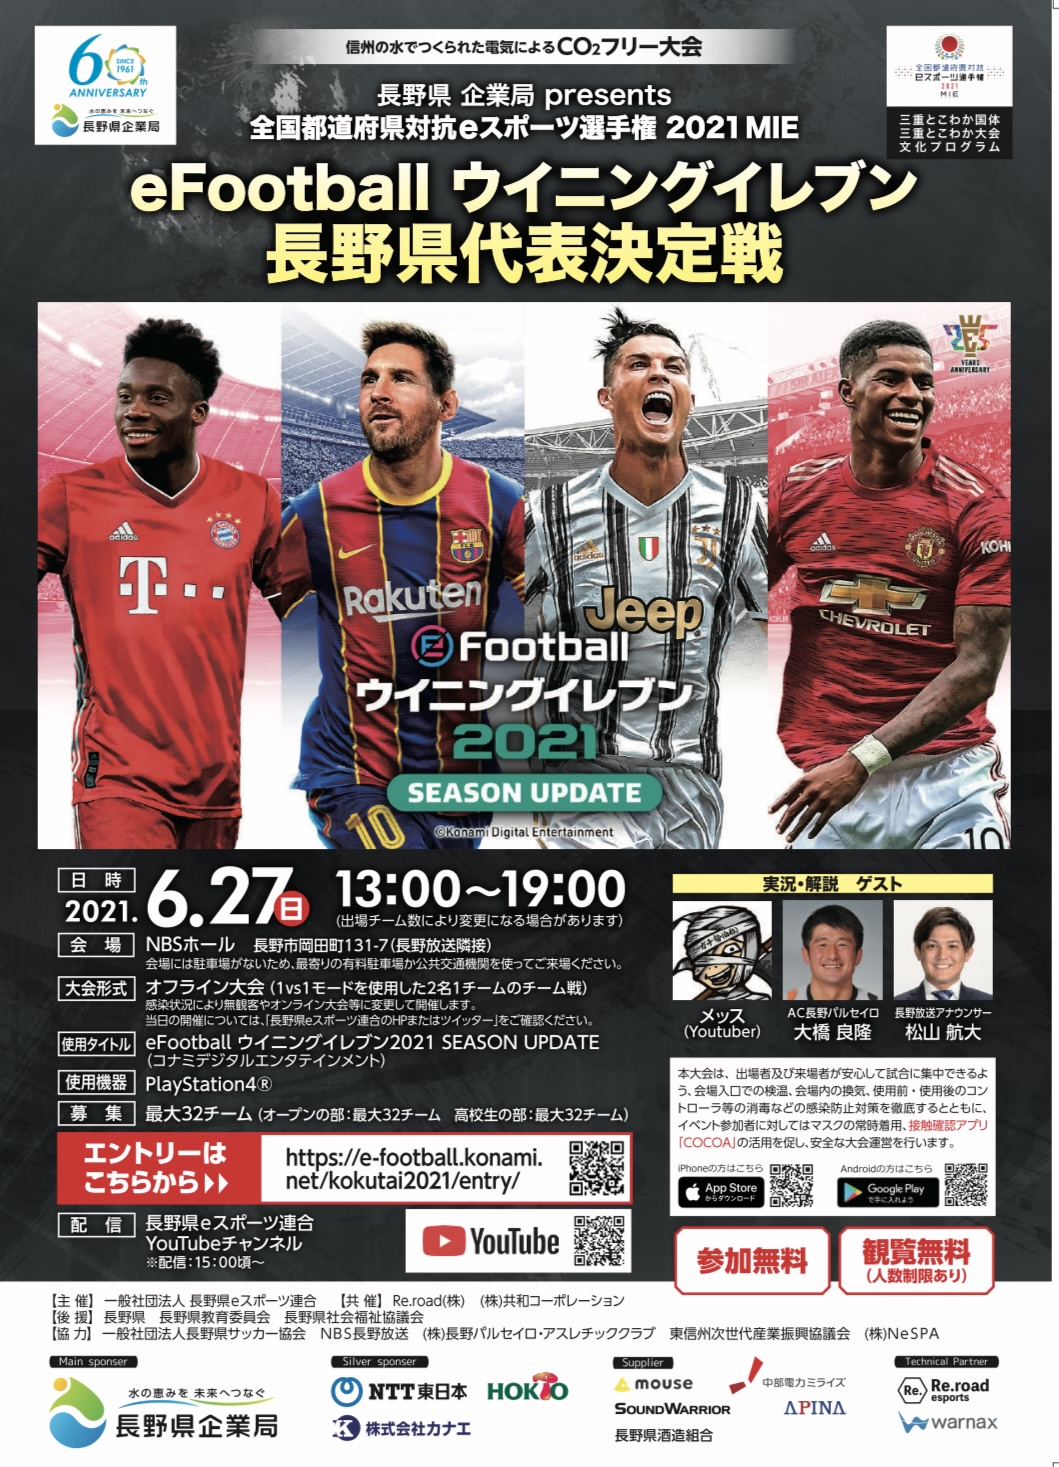 eFootball ウイニングイレブン \長野県代表決定戦/